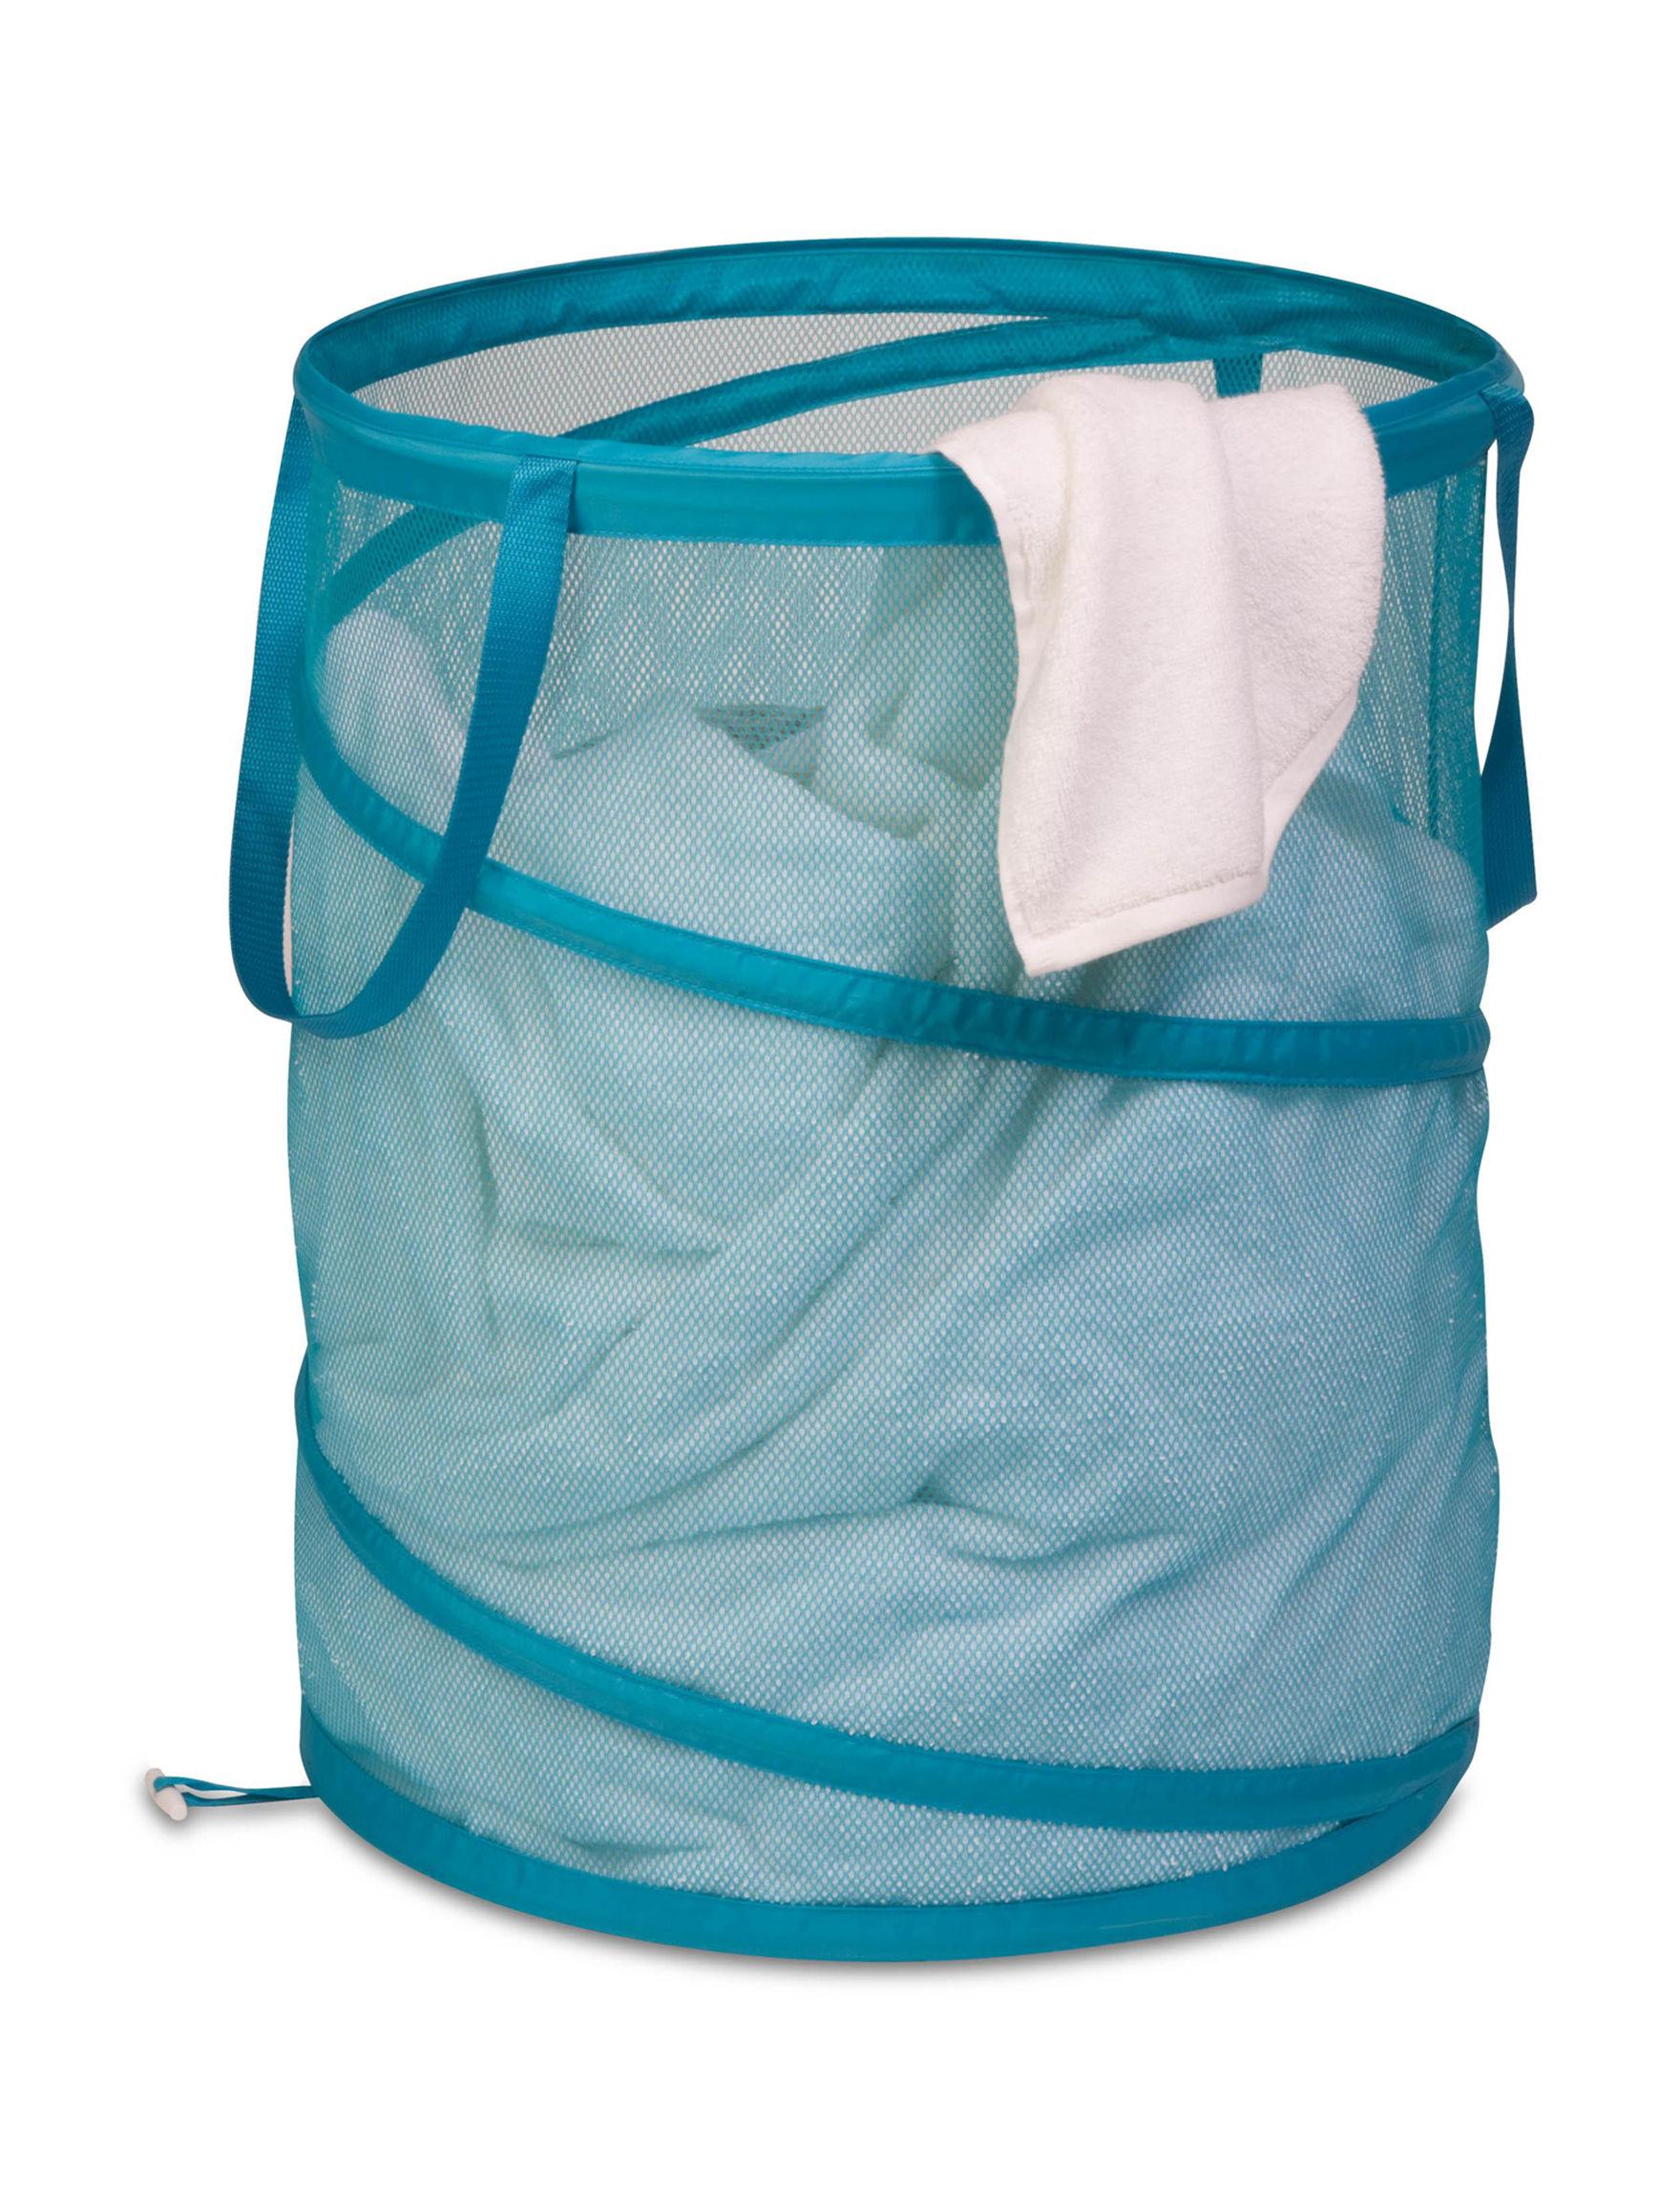 Honey-Can-Do International  Laundry Hampers Storage & Organization